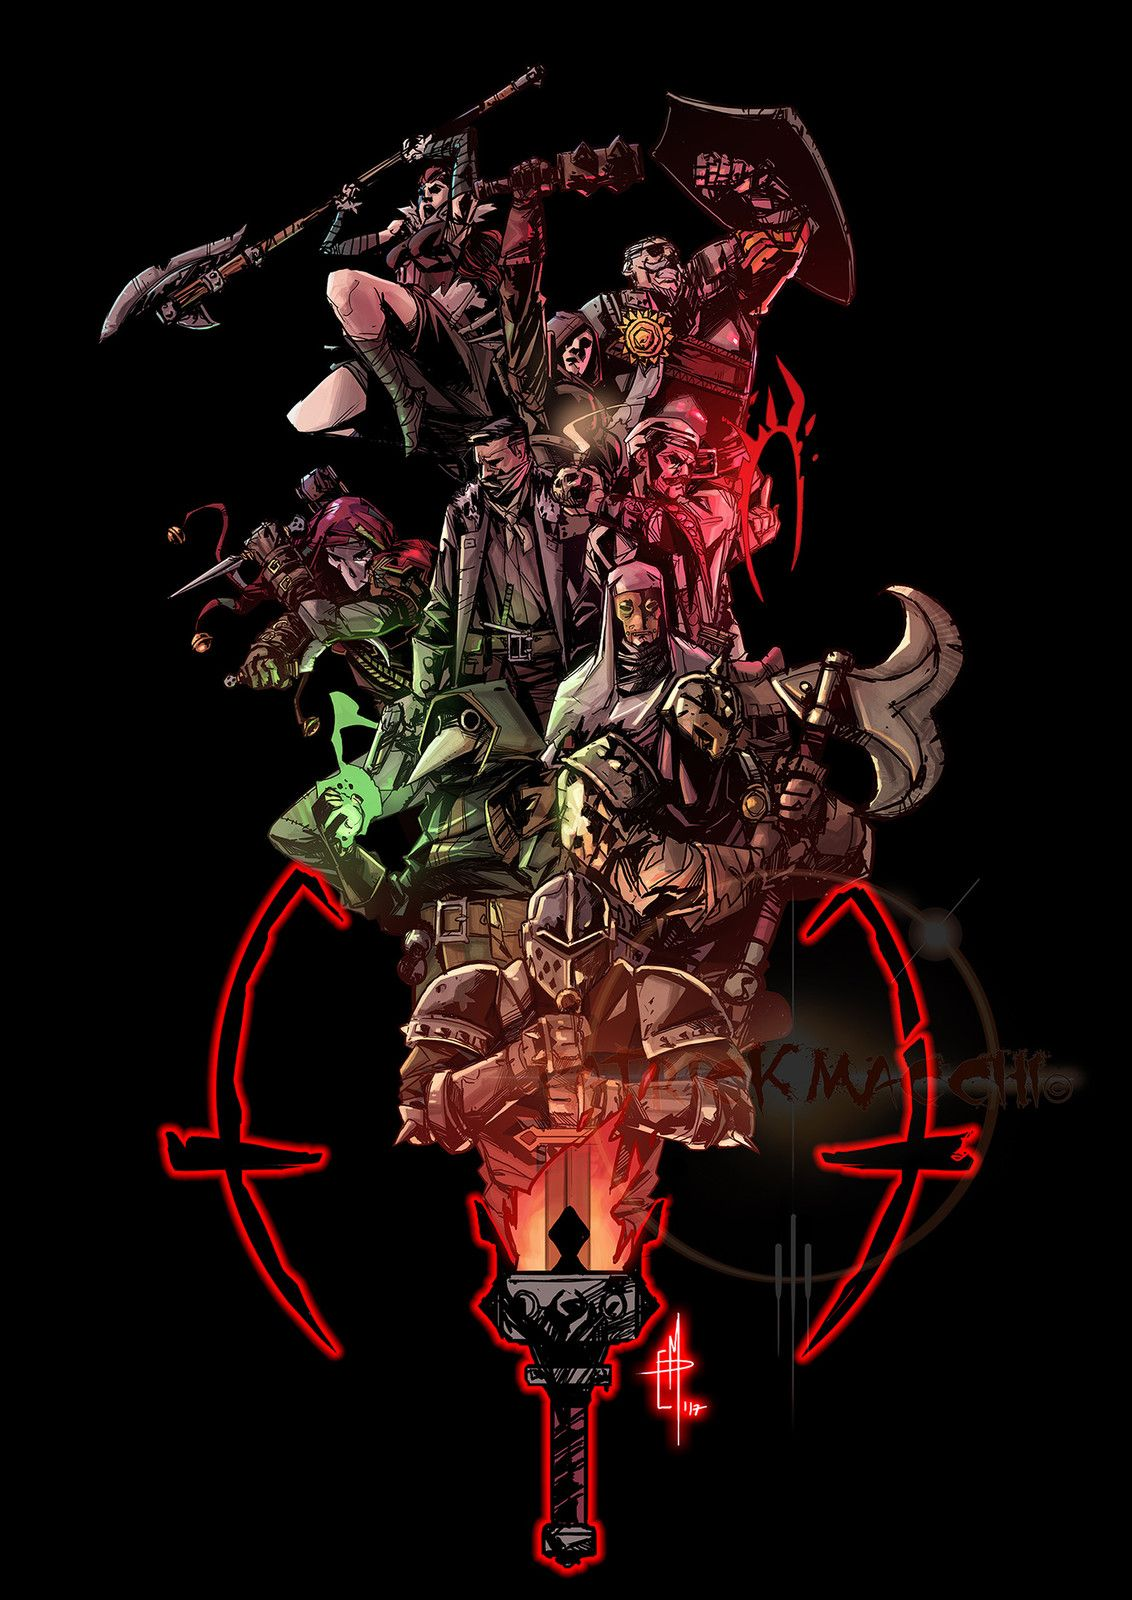 Darkest Dungeon Fanart Patrick Macchi On Artstation At Https Www Artstation Com Artwork G1aqq Darkest Dungeon Darkest Dungeon Art Darkest Dungeon Crusader